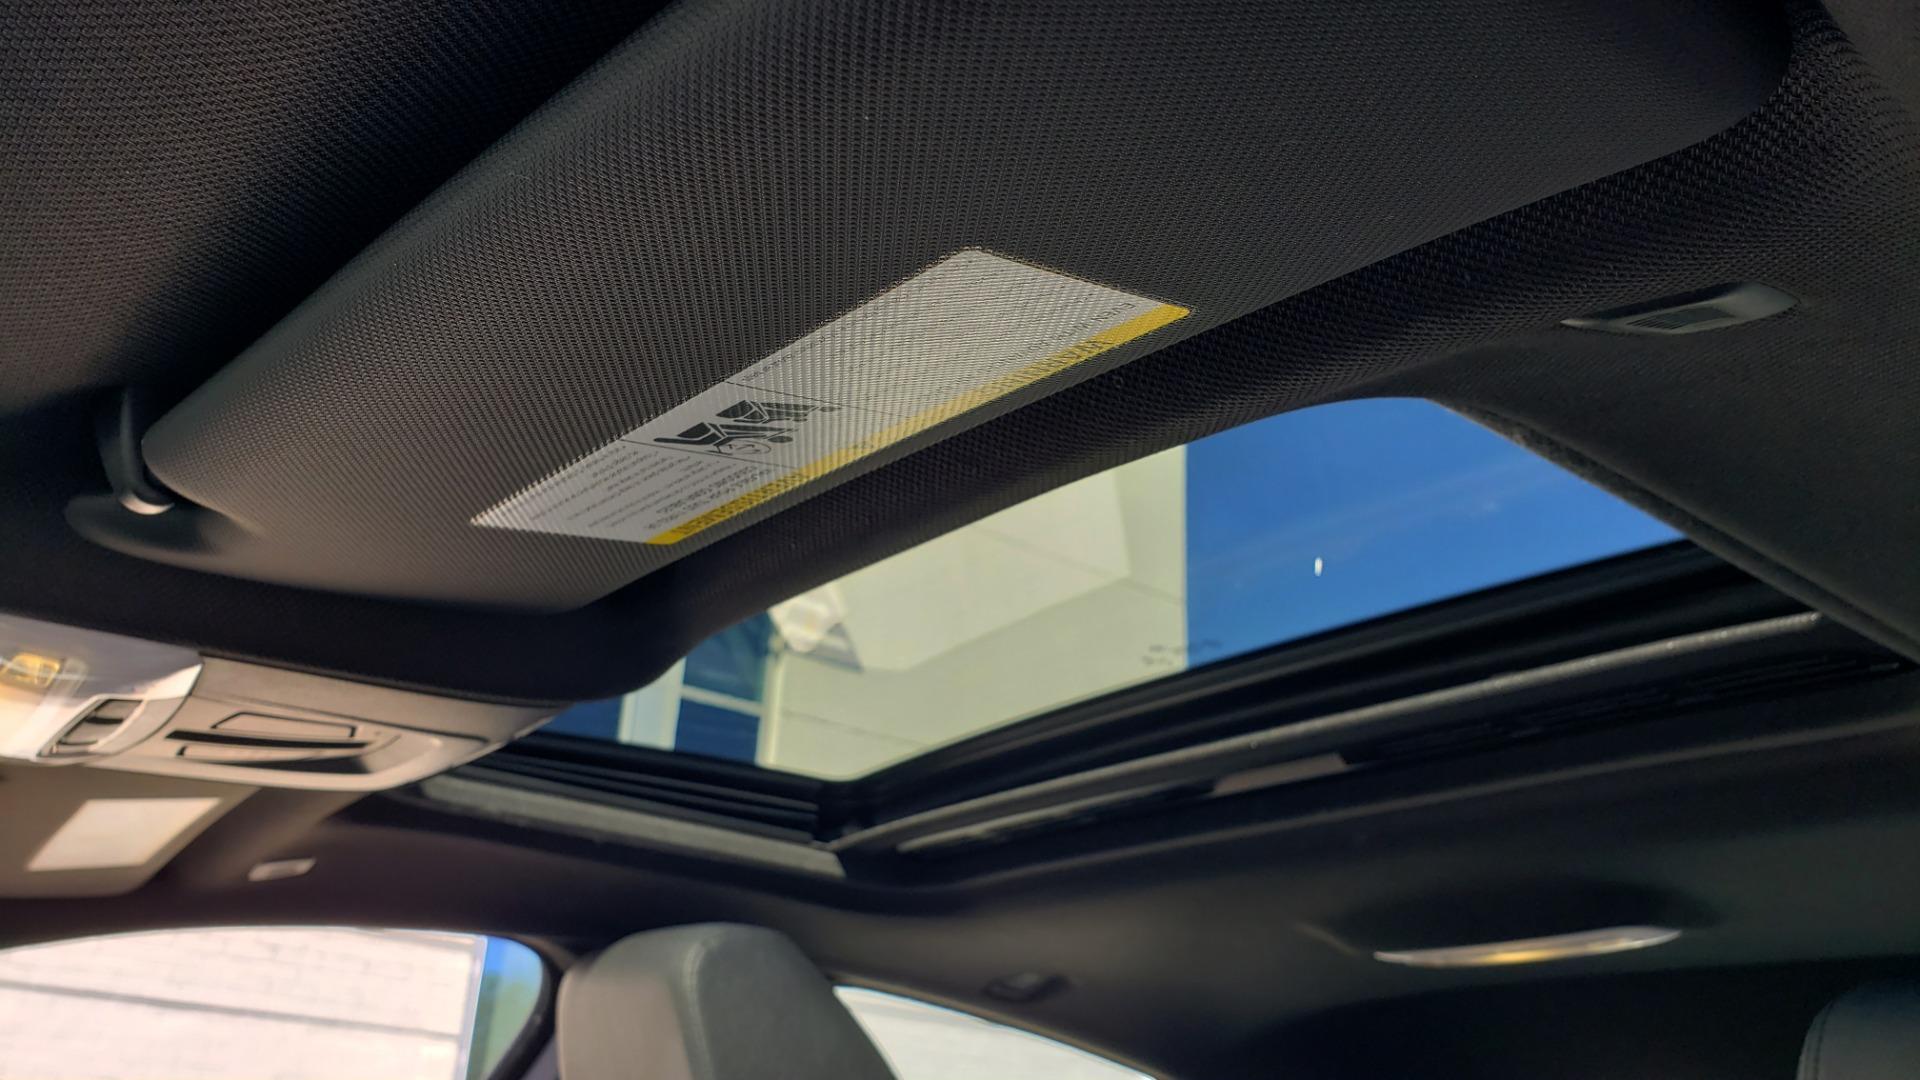 Used 2018 BMW 4 SERIES 430IXDRIVE / PREMIUM / NAV / SUNROOF / ESSENTIALS PKG for sale $29,495 at Formula Imports in Charlotte NC 28227 32